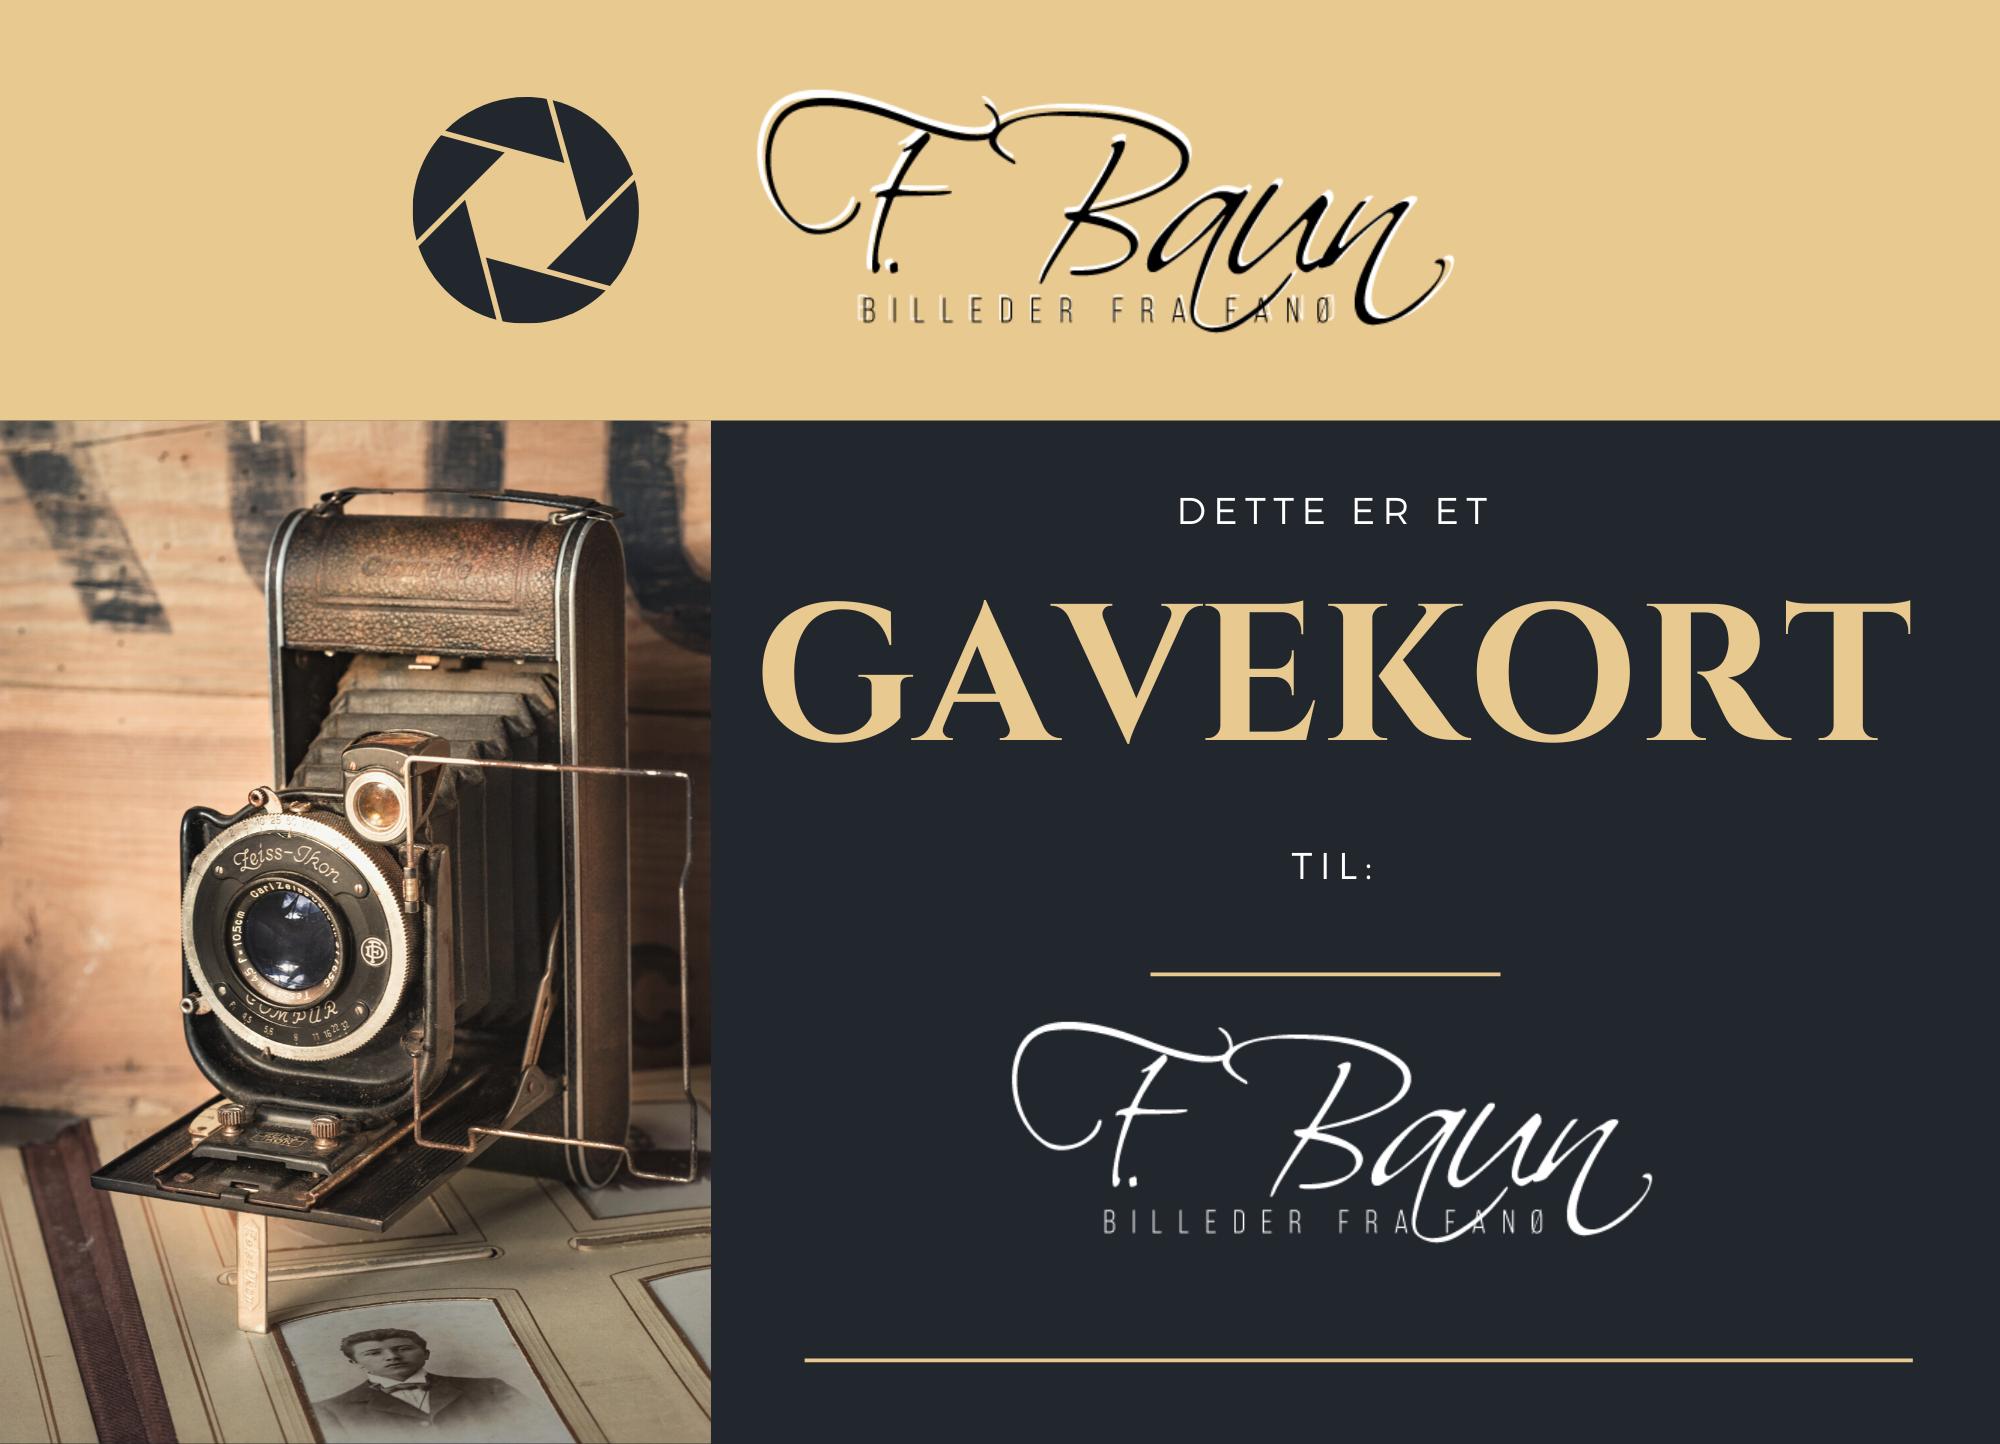 Gavekort - fotografering i studie